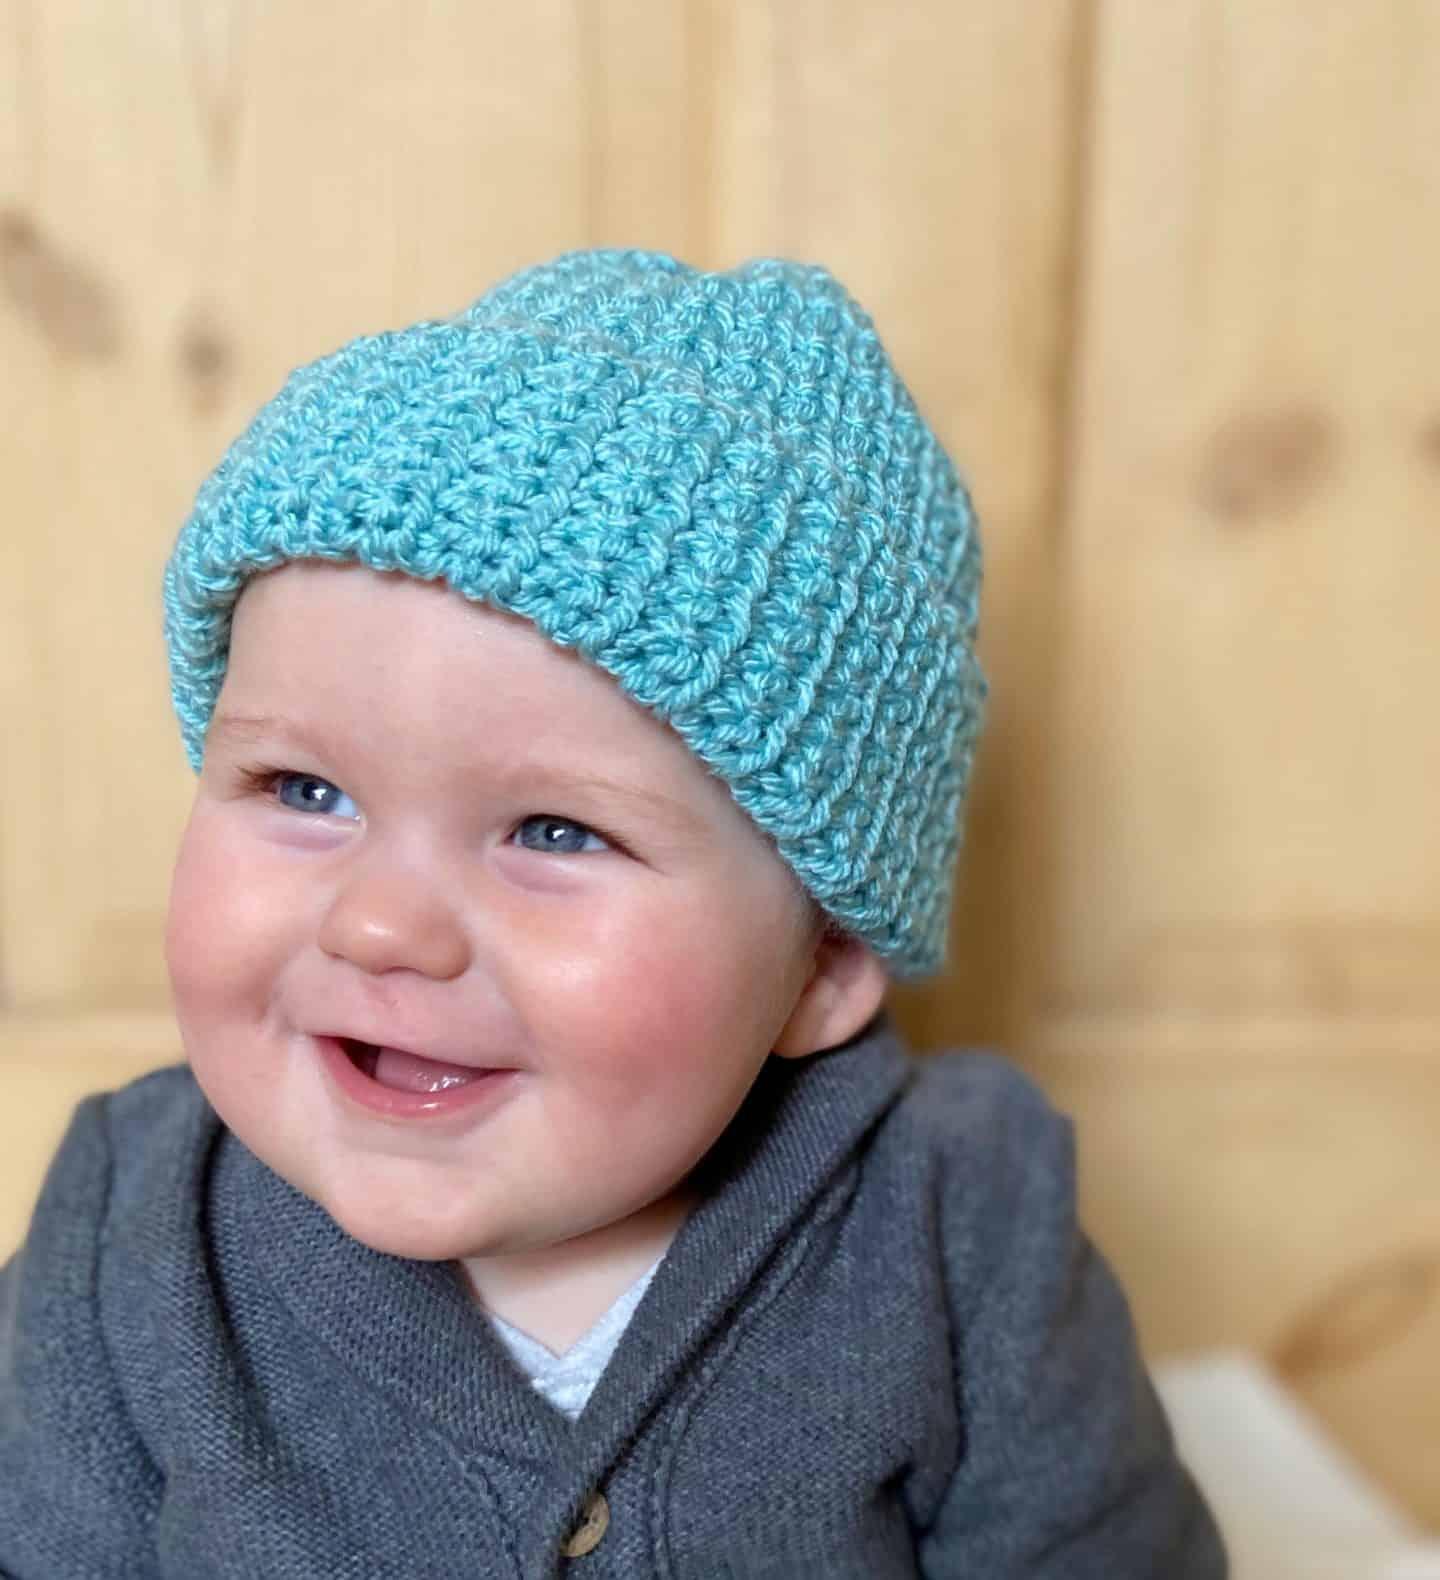 smiling baby boy in easy crochet beanie hat